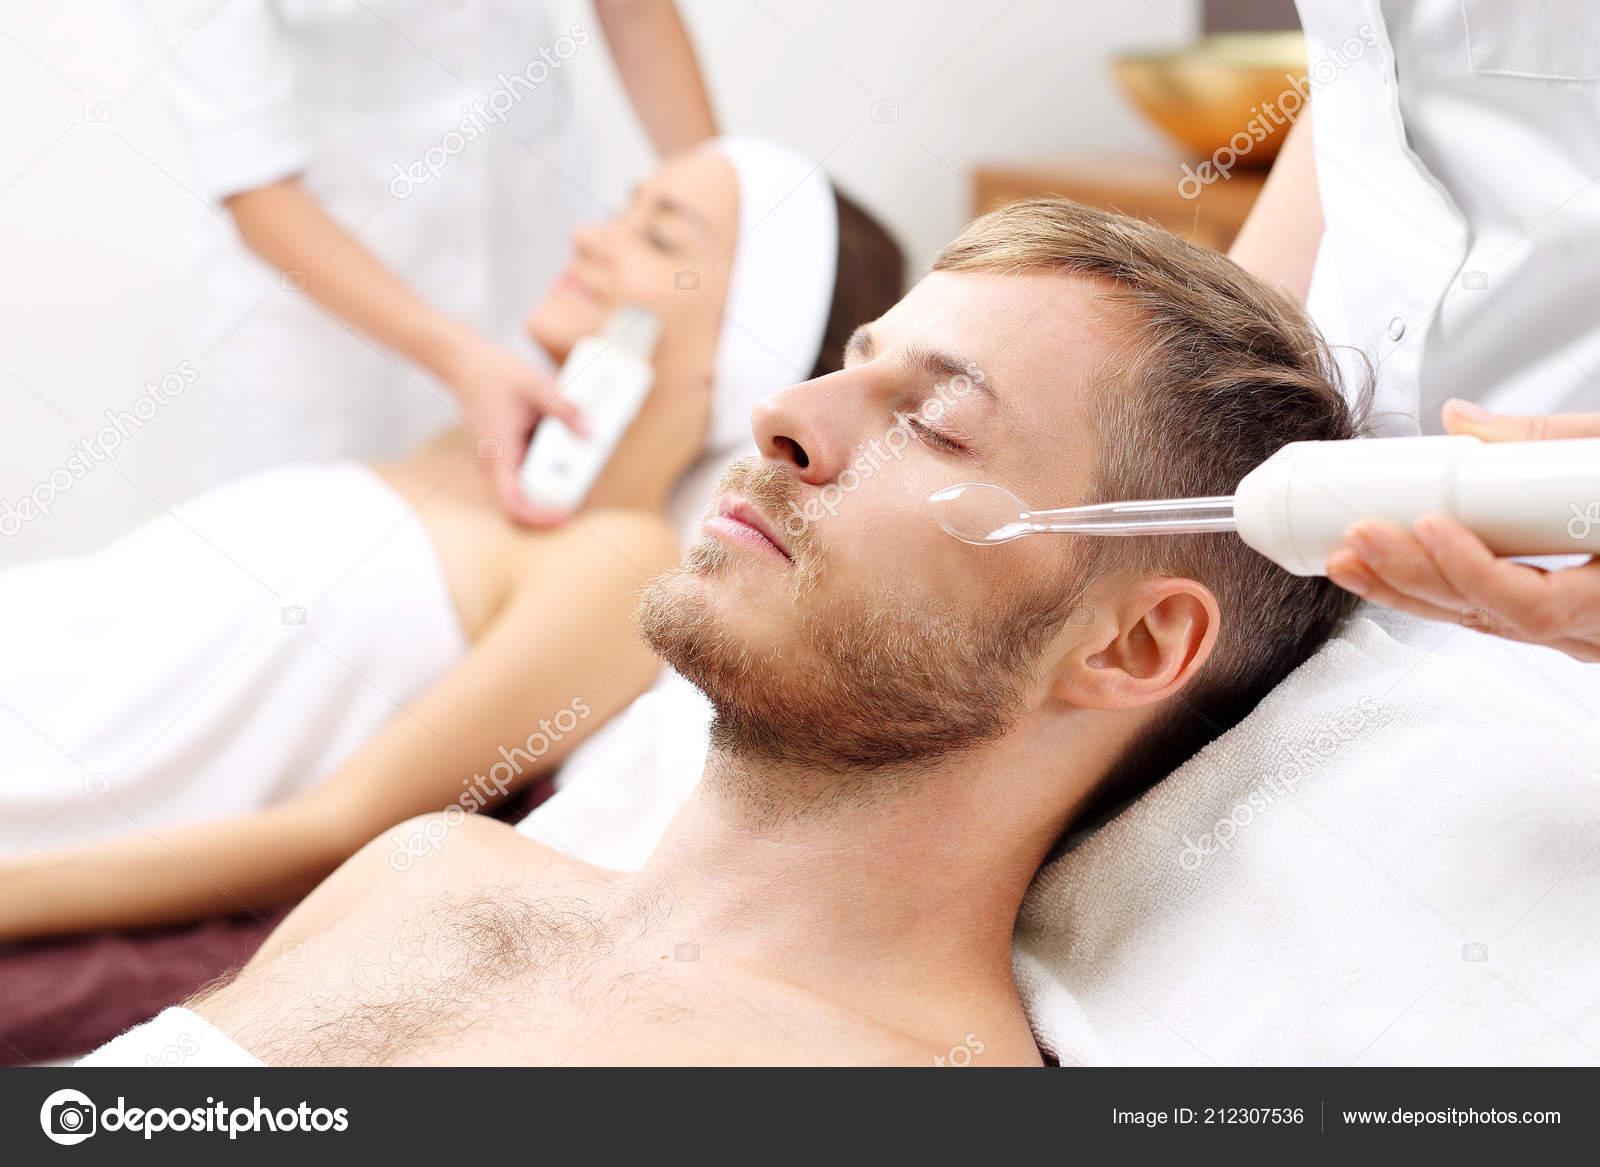 Spa Two Man Woman Beauty Salon Face Skin Care Treatment Stock Photo C Robertprzybysz 212307536